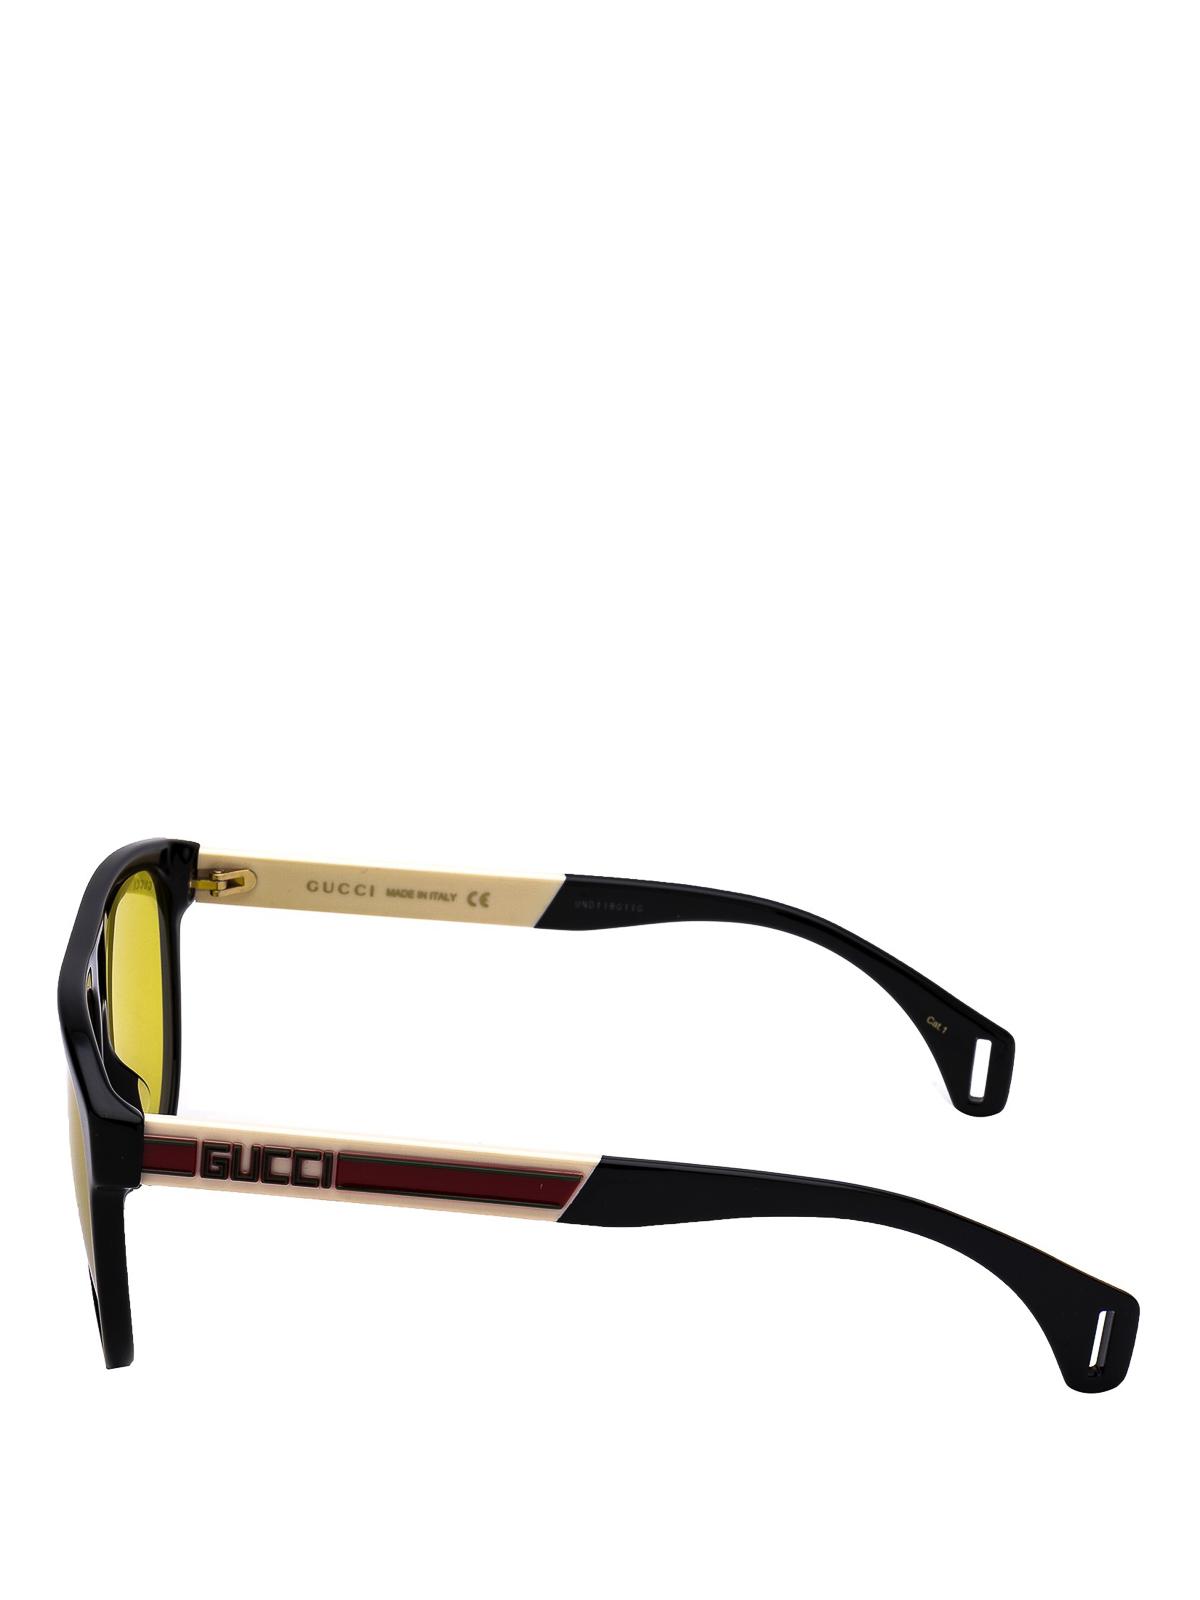 33f0ab51ef7 Gucci - Yellow lens black round sunglasses - sunglasses - GG0462S 001